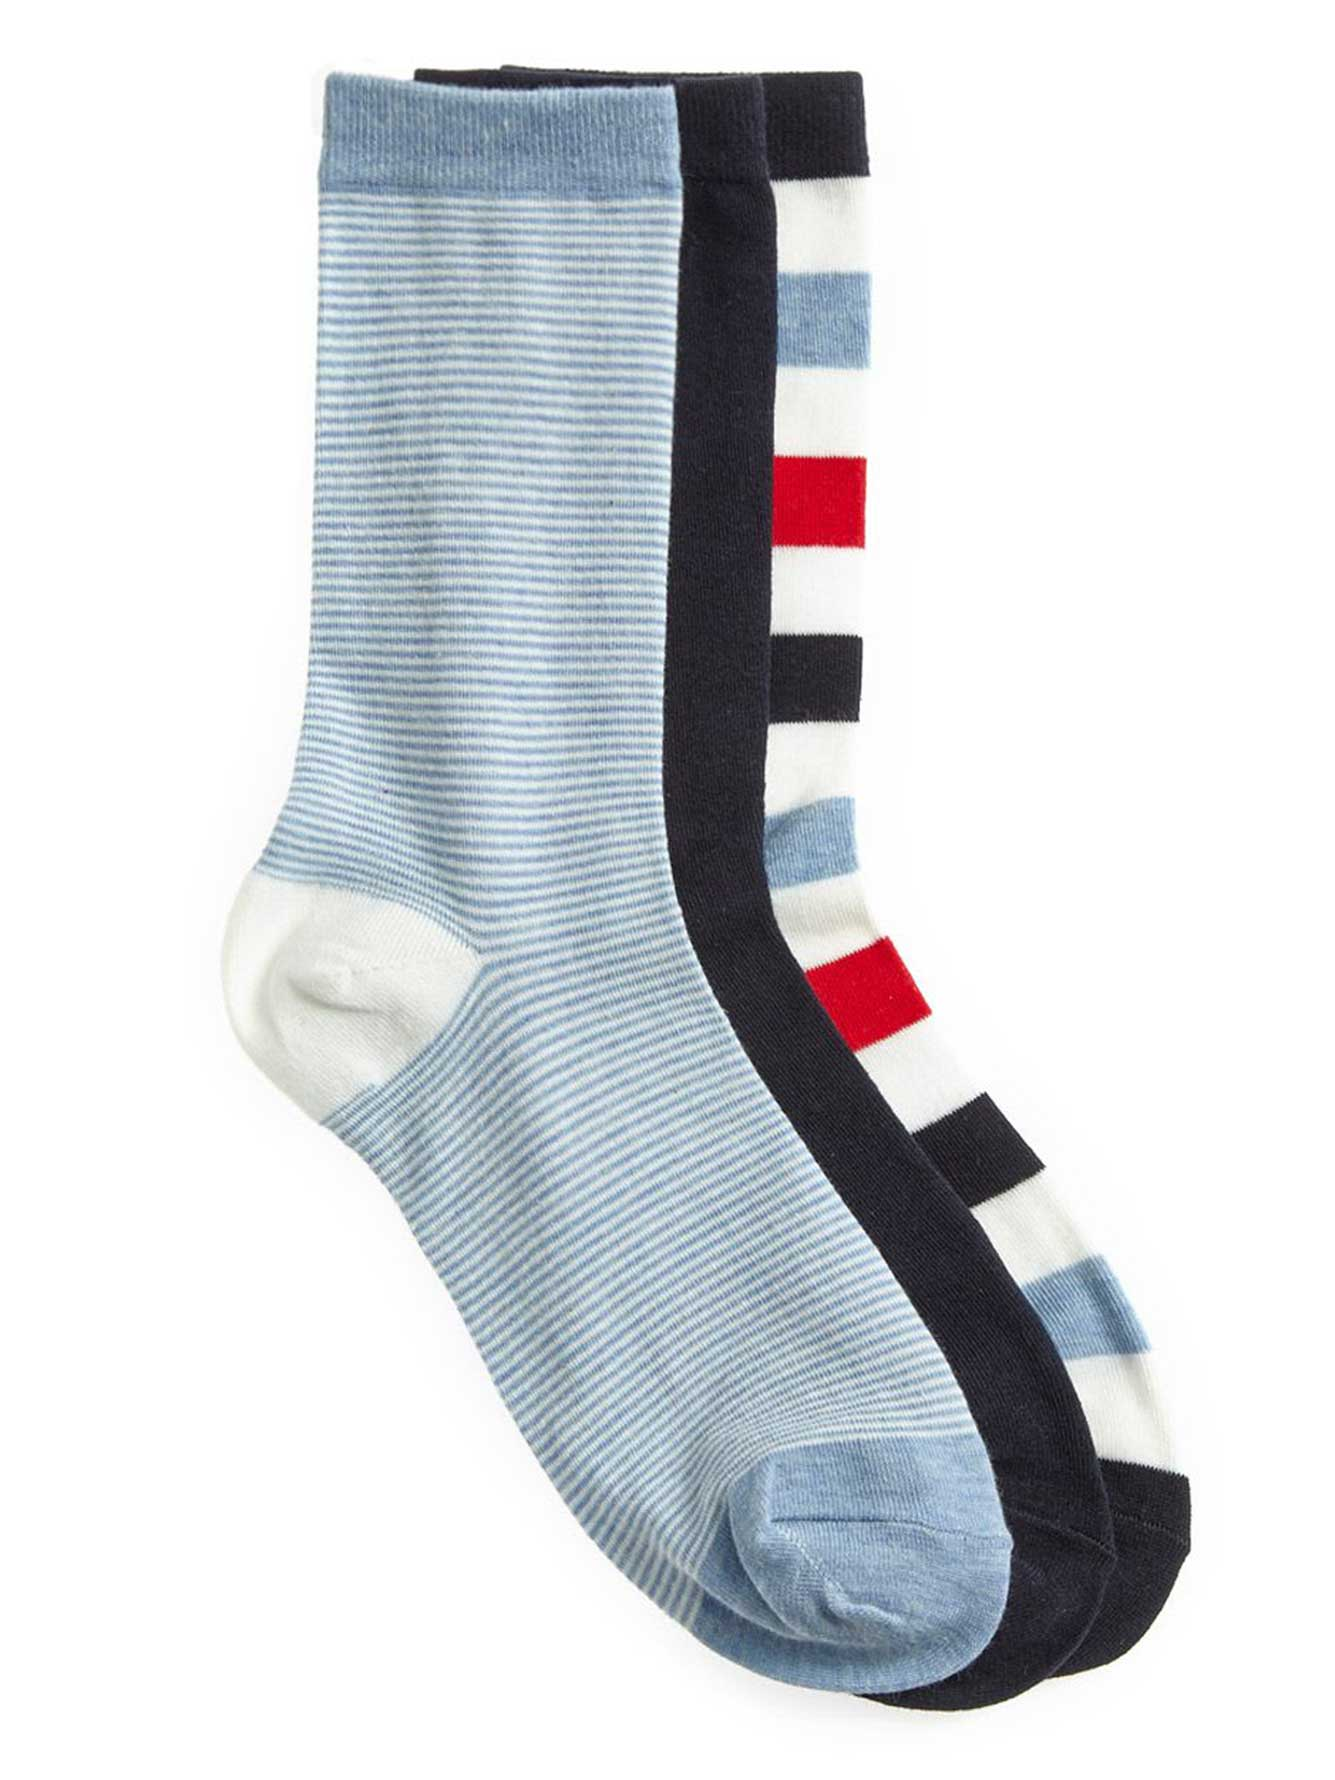 29eb40cf17 Colorful Striped Socks - 3 Pack | Addition Elle